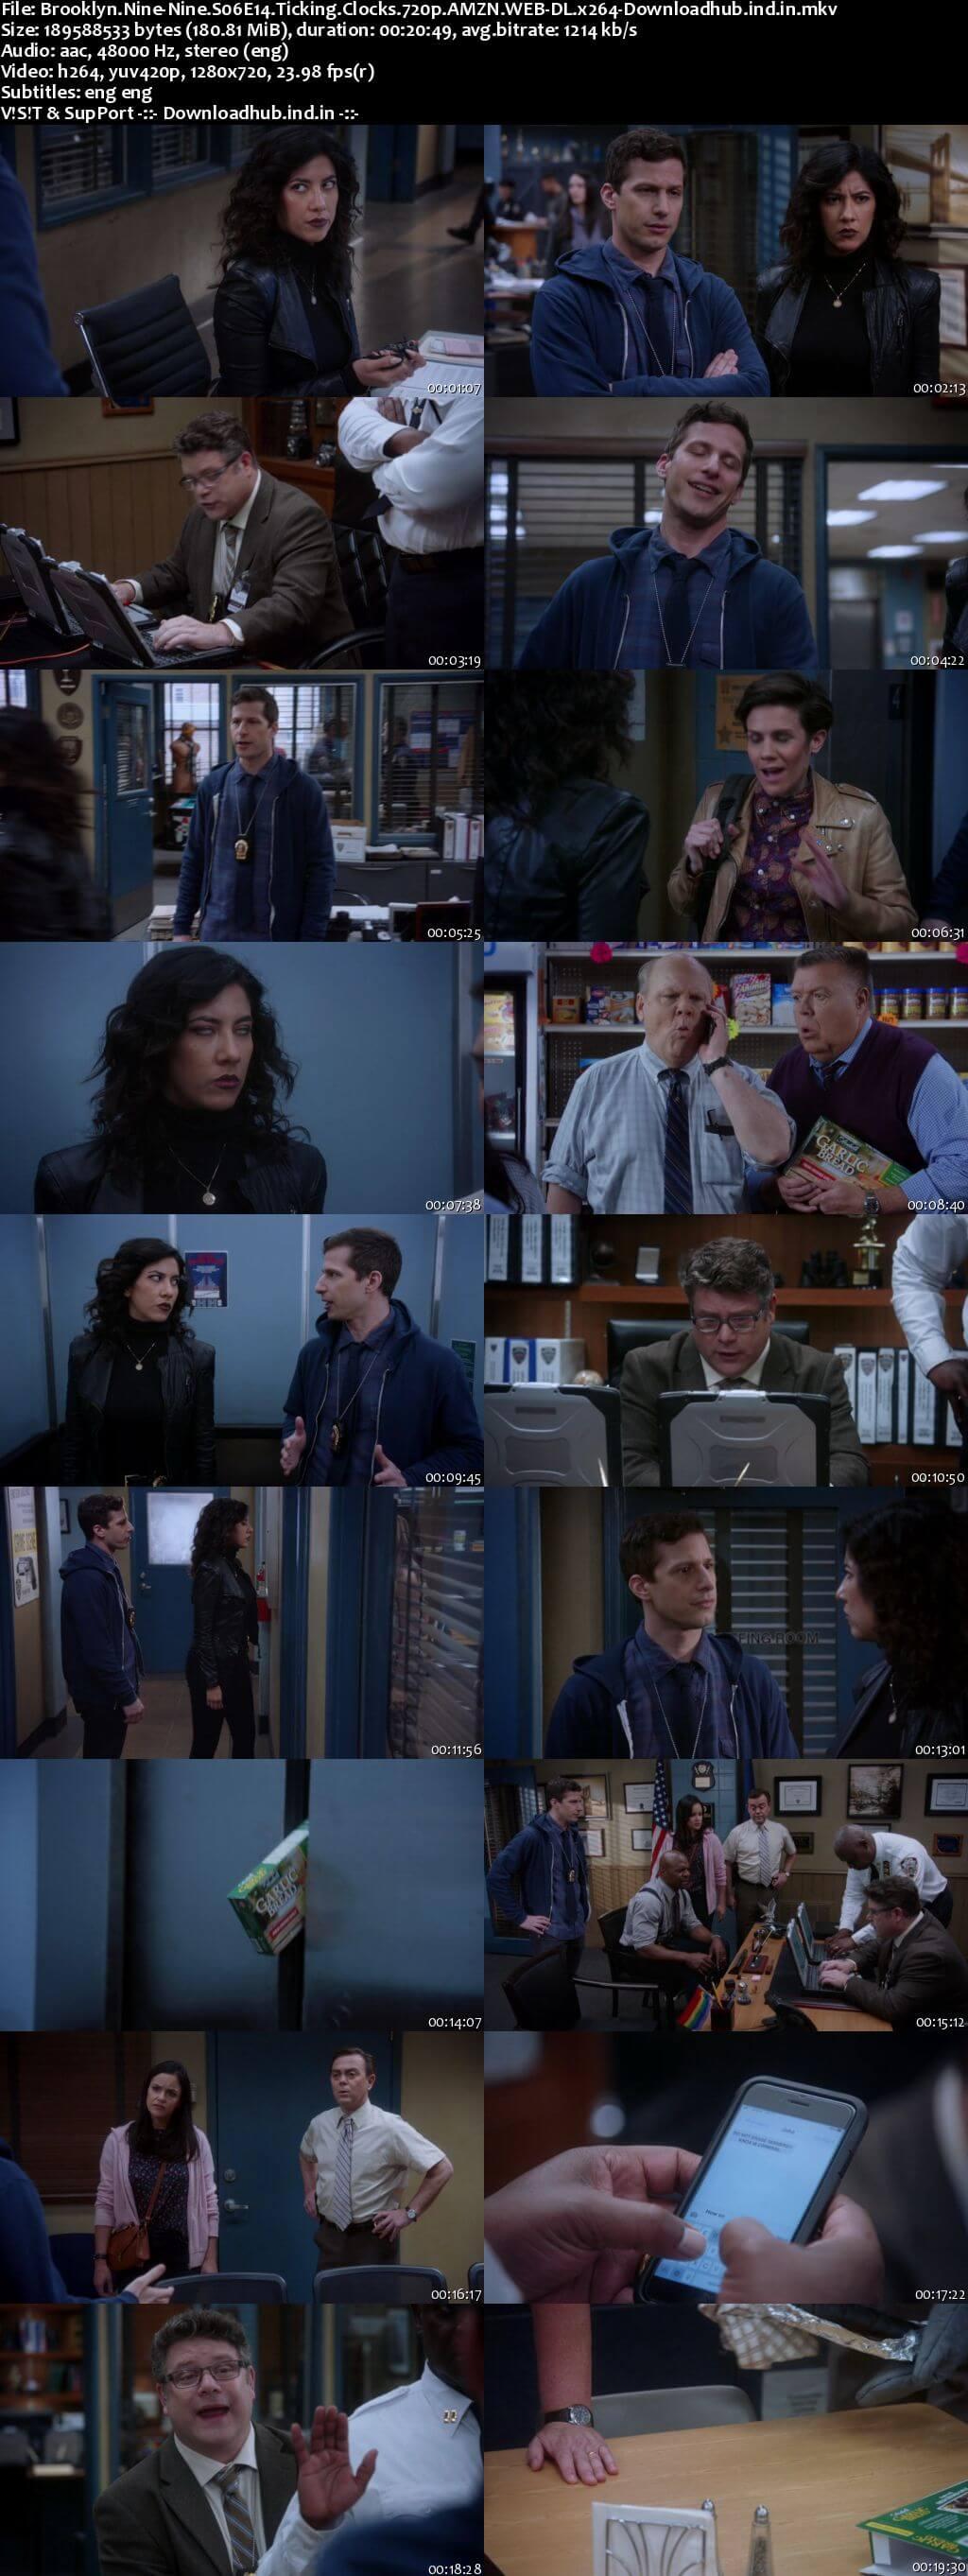 Brooklyn Nine-Nine S06E14 180MB WEB-DL 720p ESubs